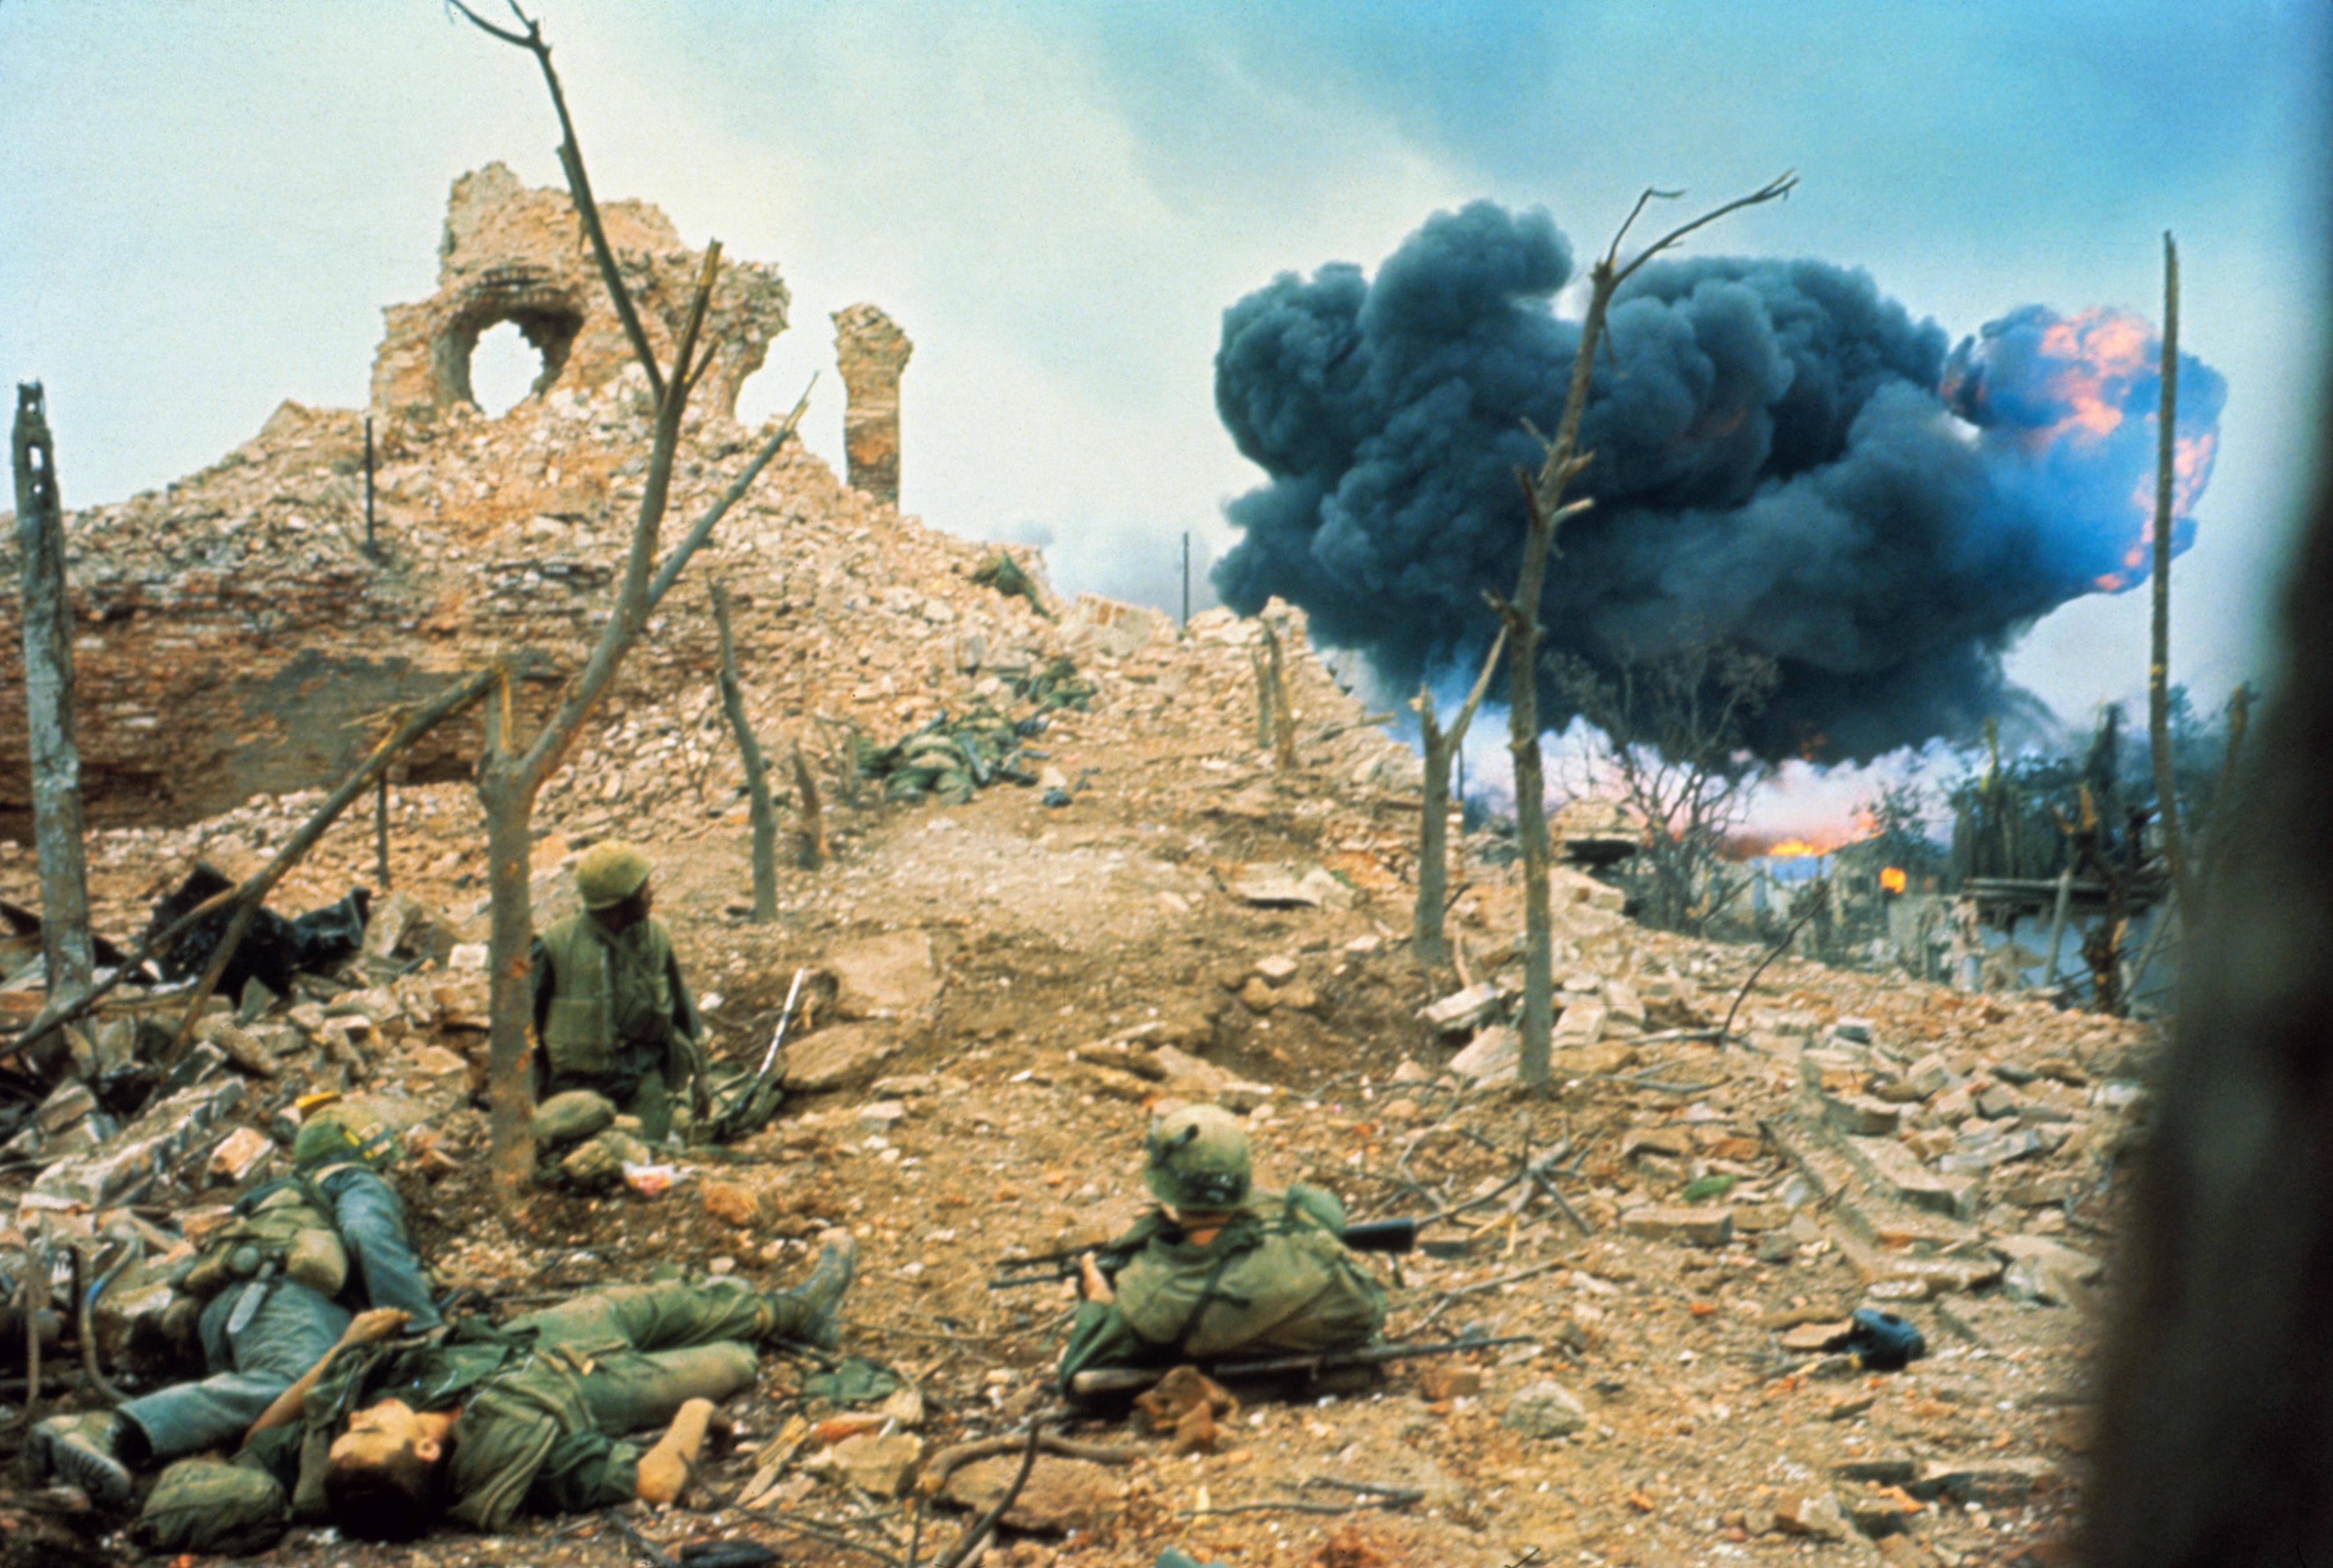 Vietnam War: Tet Offensive Pictures - Vietnam War History ...